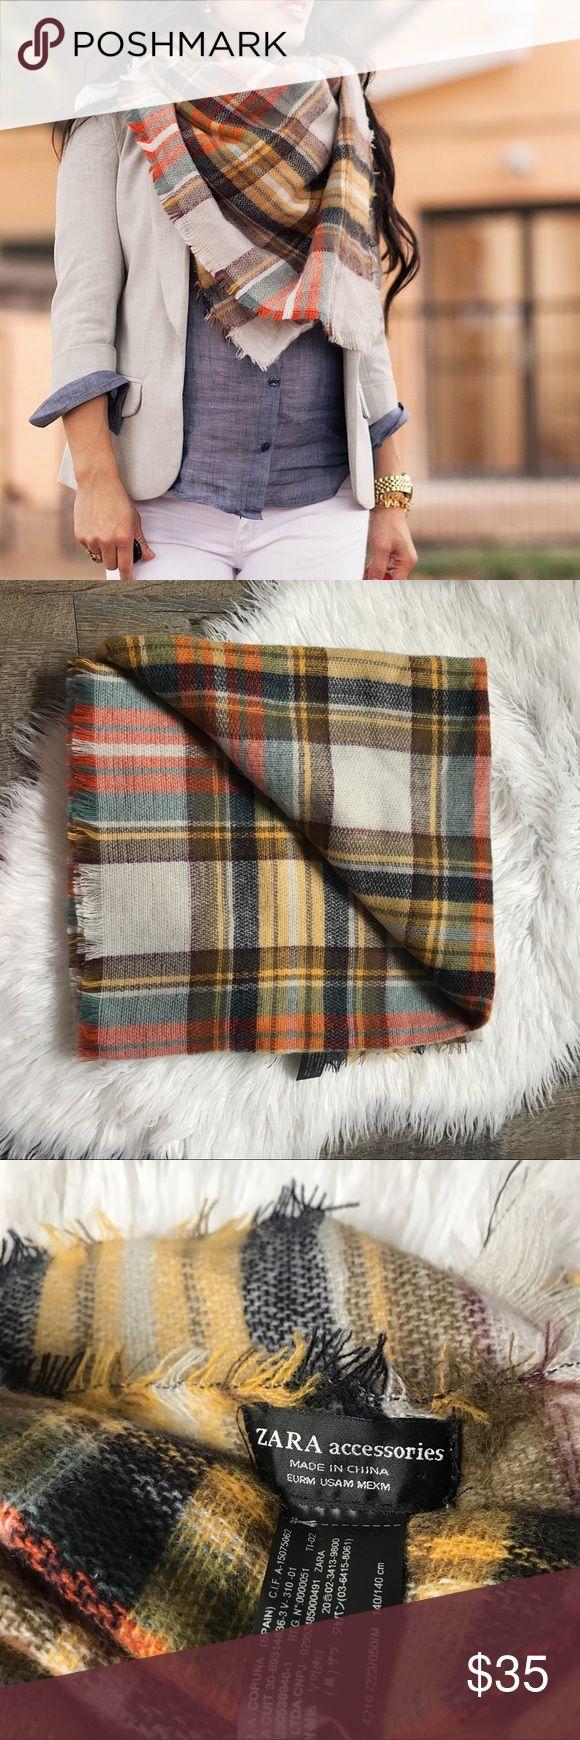 Zara Plaid Tartan Blanket Scarf Super soft neutral colored blanket scarf from Zara. Excellent condition. No trades! Zara Accessories Scarves & Wraps